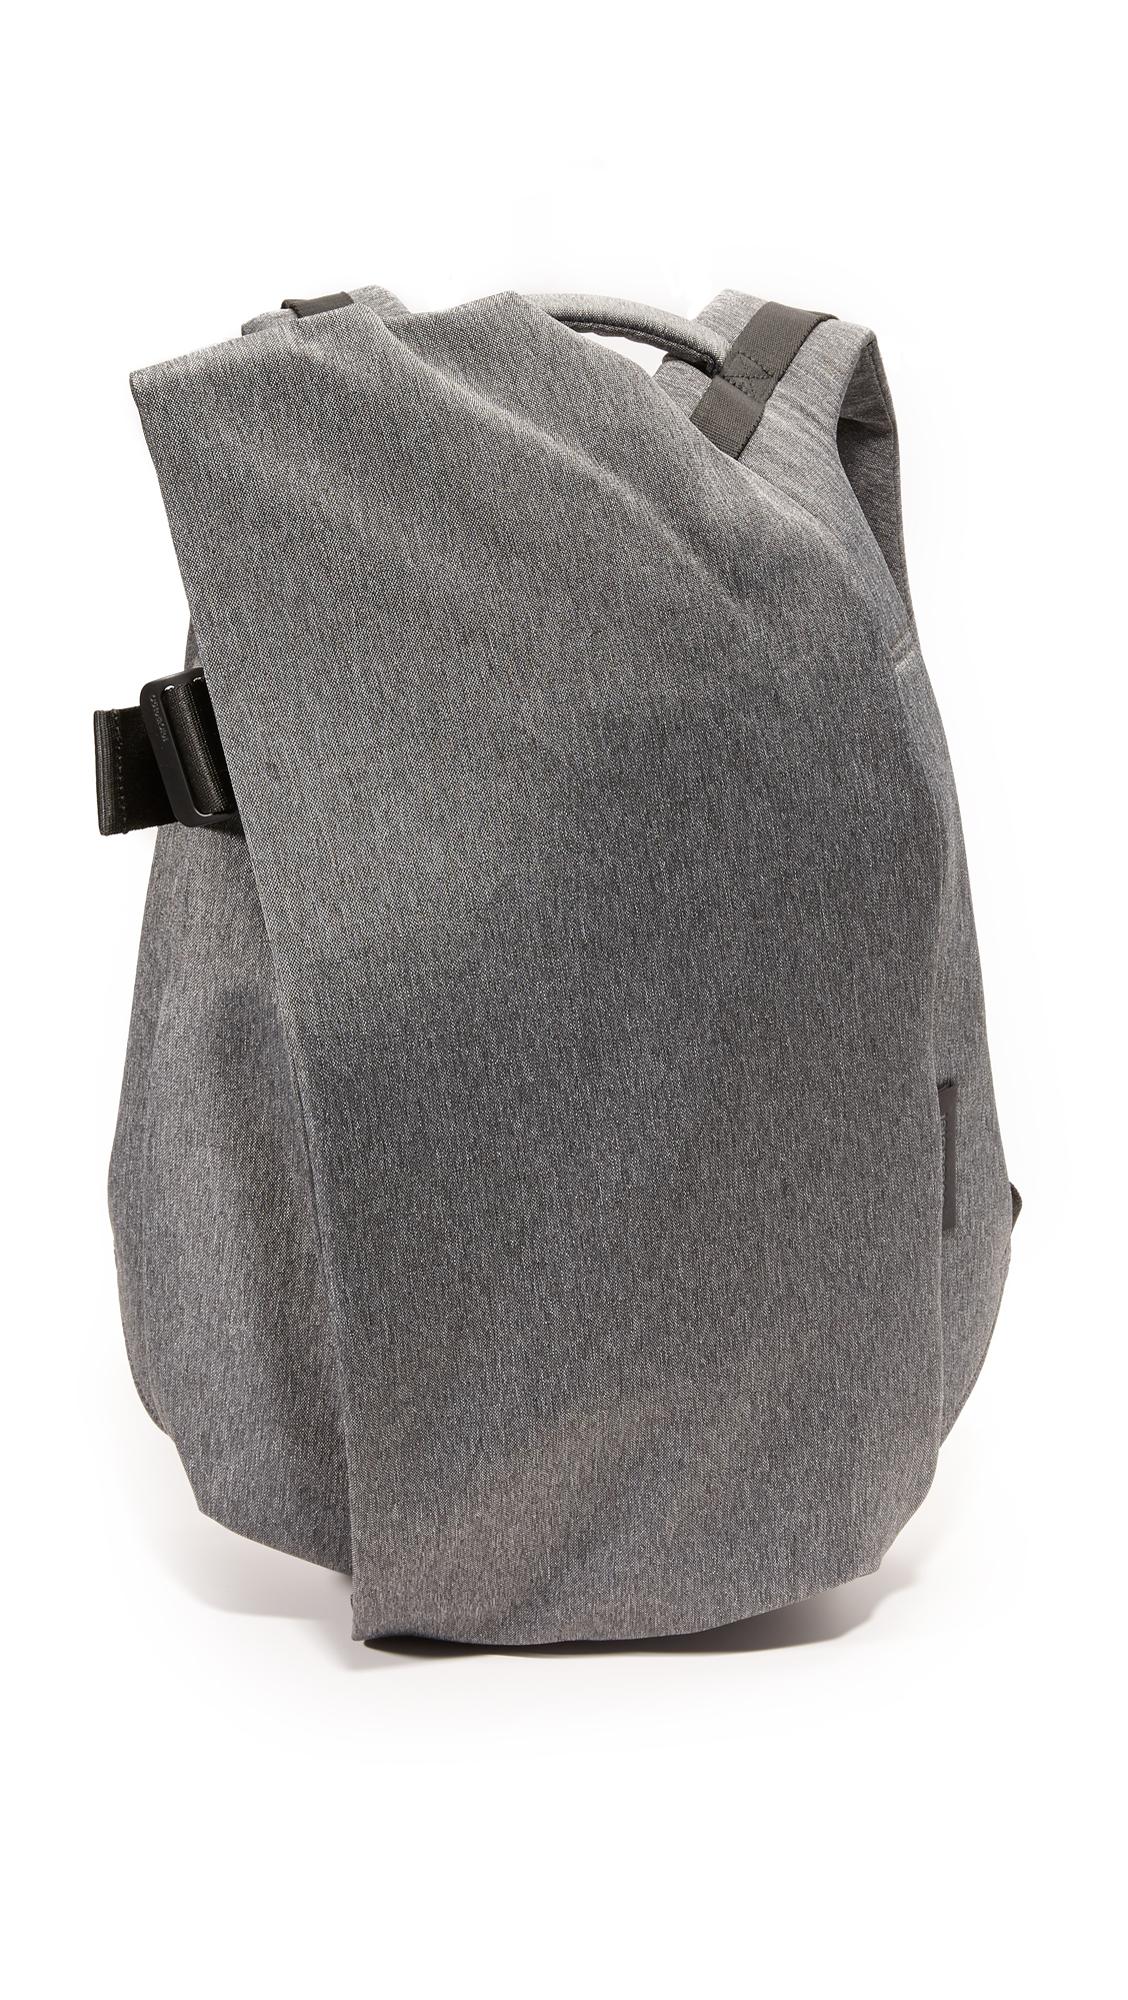 Isar Ecoyarn Medium Backpack